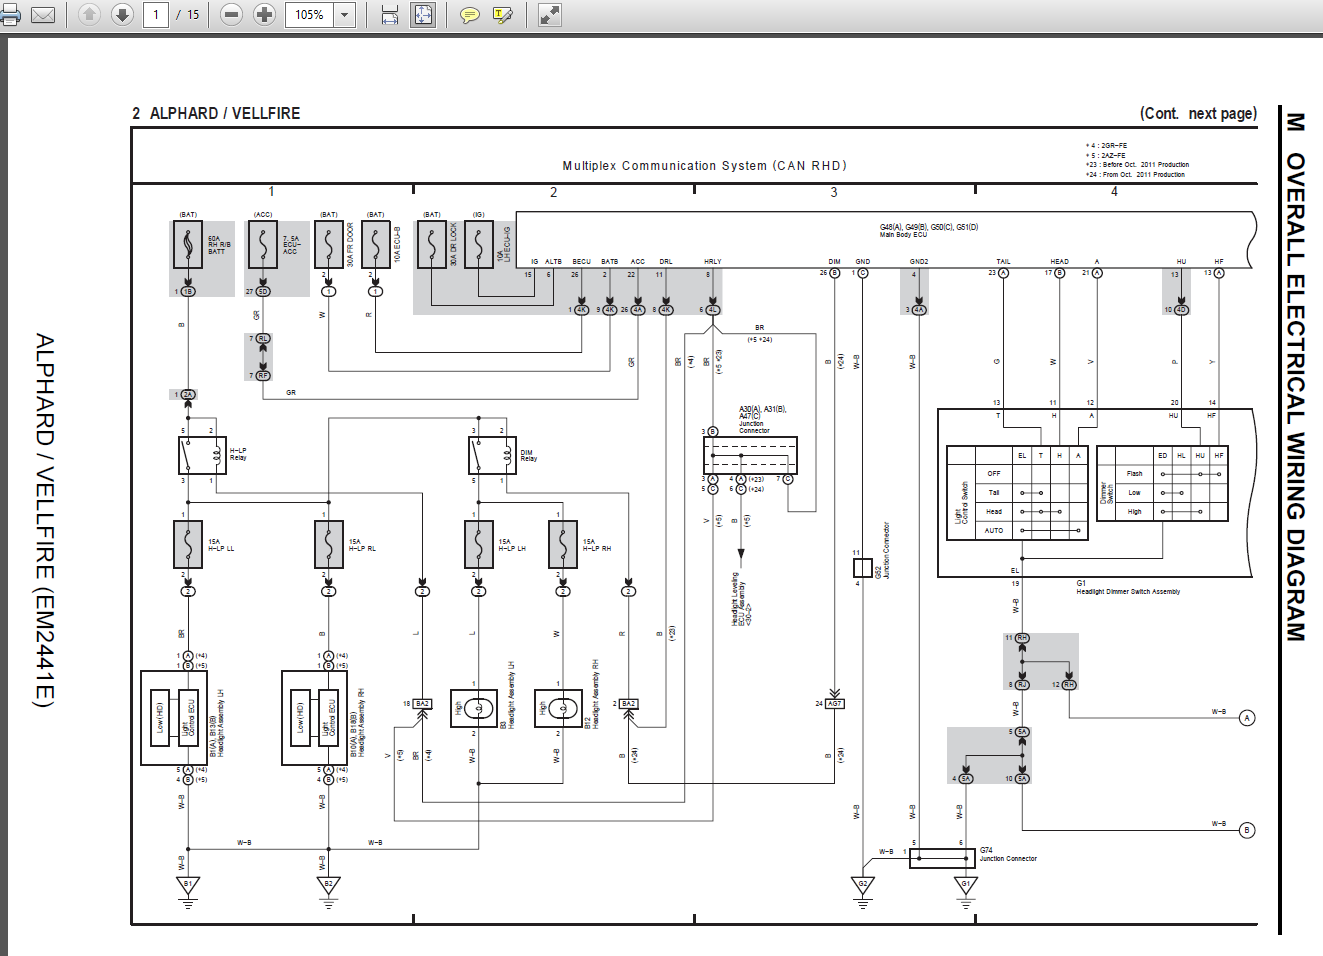 toyota vellfire wiring diagram - wiring diagrams all brown-web -  brown-web.babelweb.it  babelweb.it